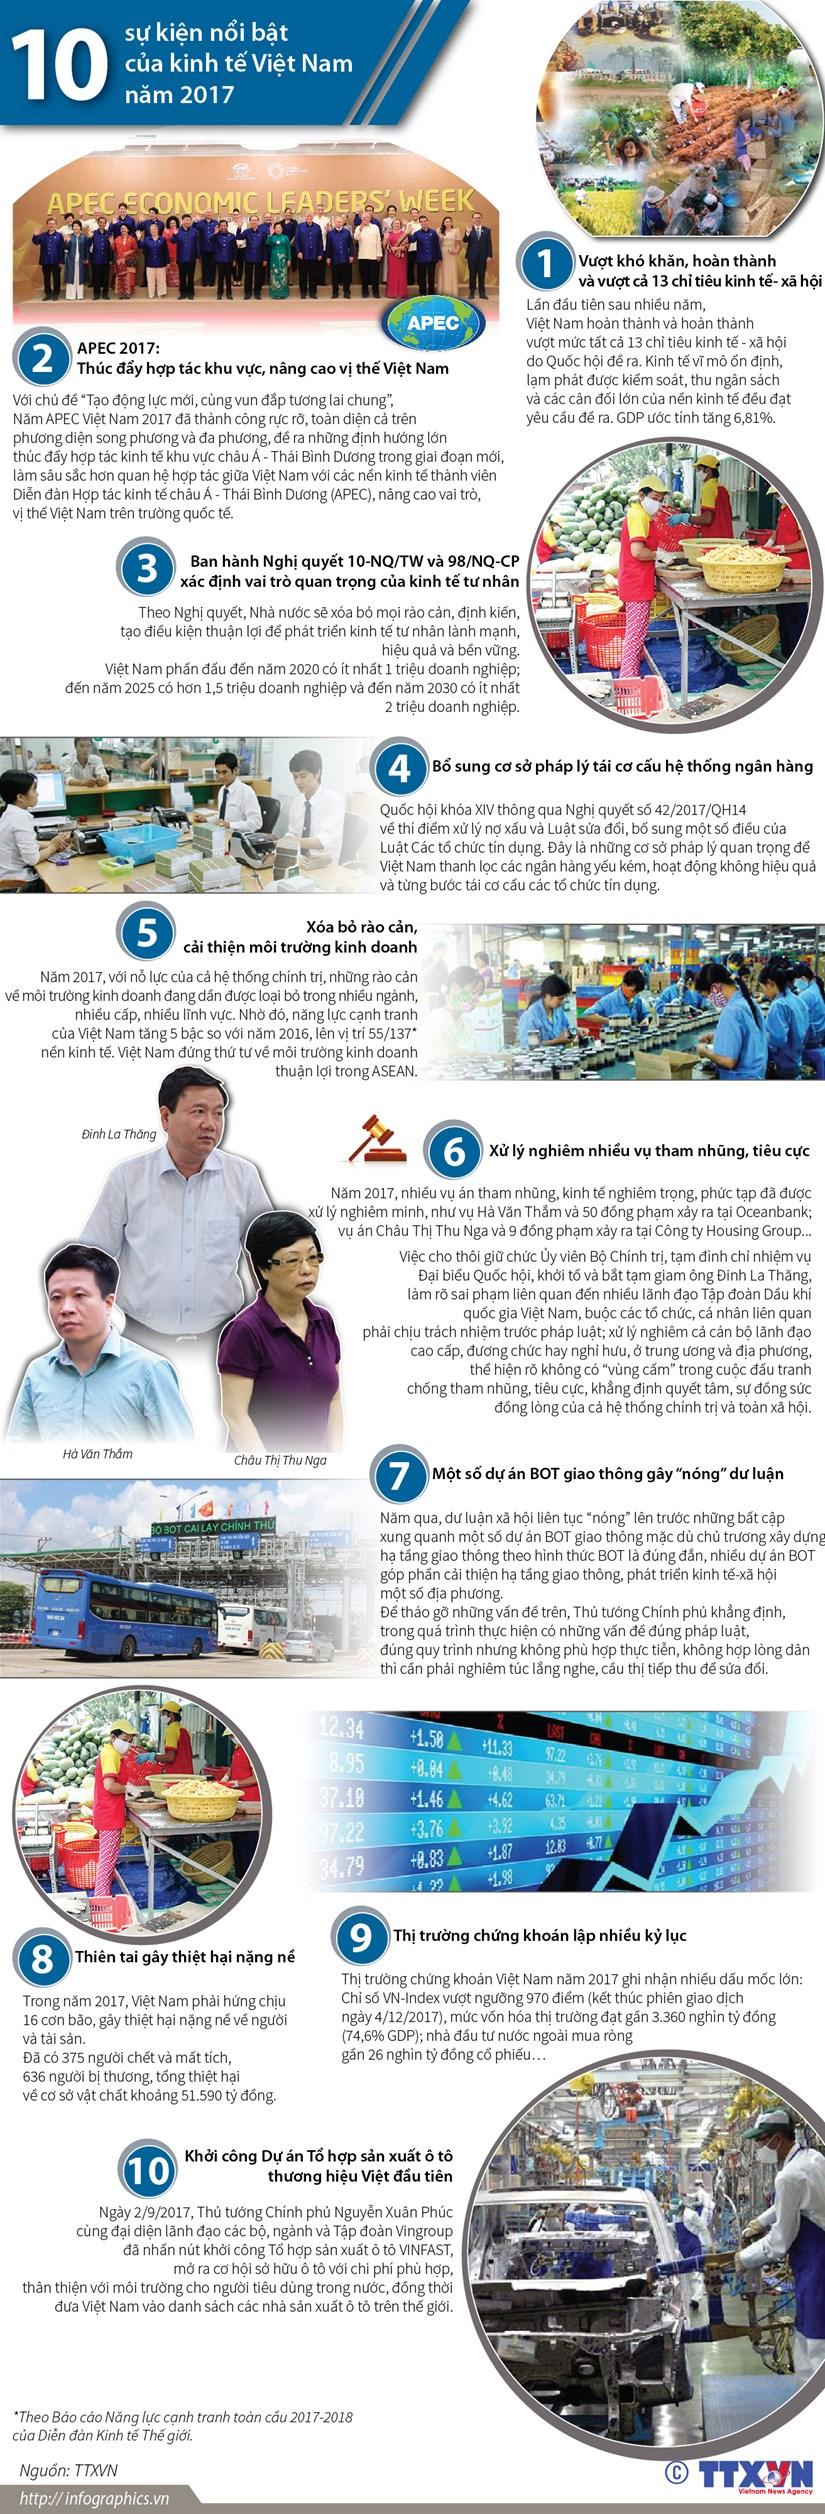 [Infographics] 10 su kien kinh te noi bat cua Viet Nam nam 2017 hinh anh 1